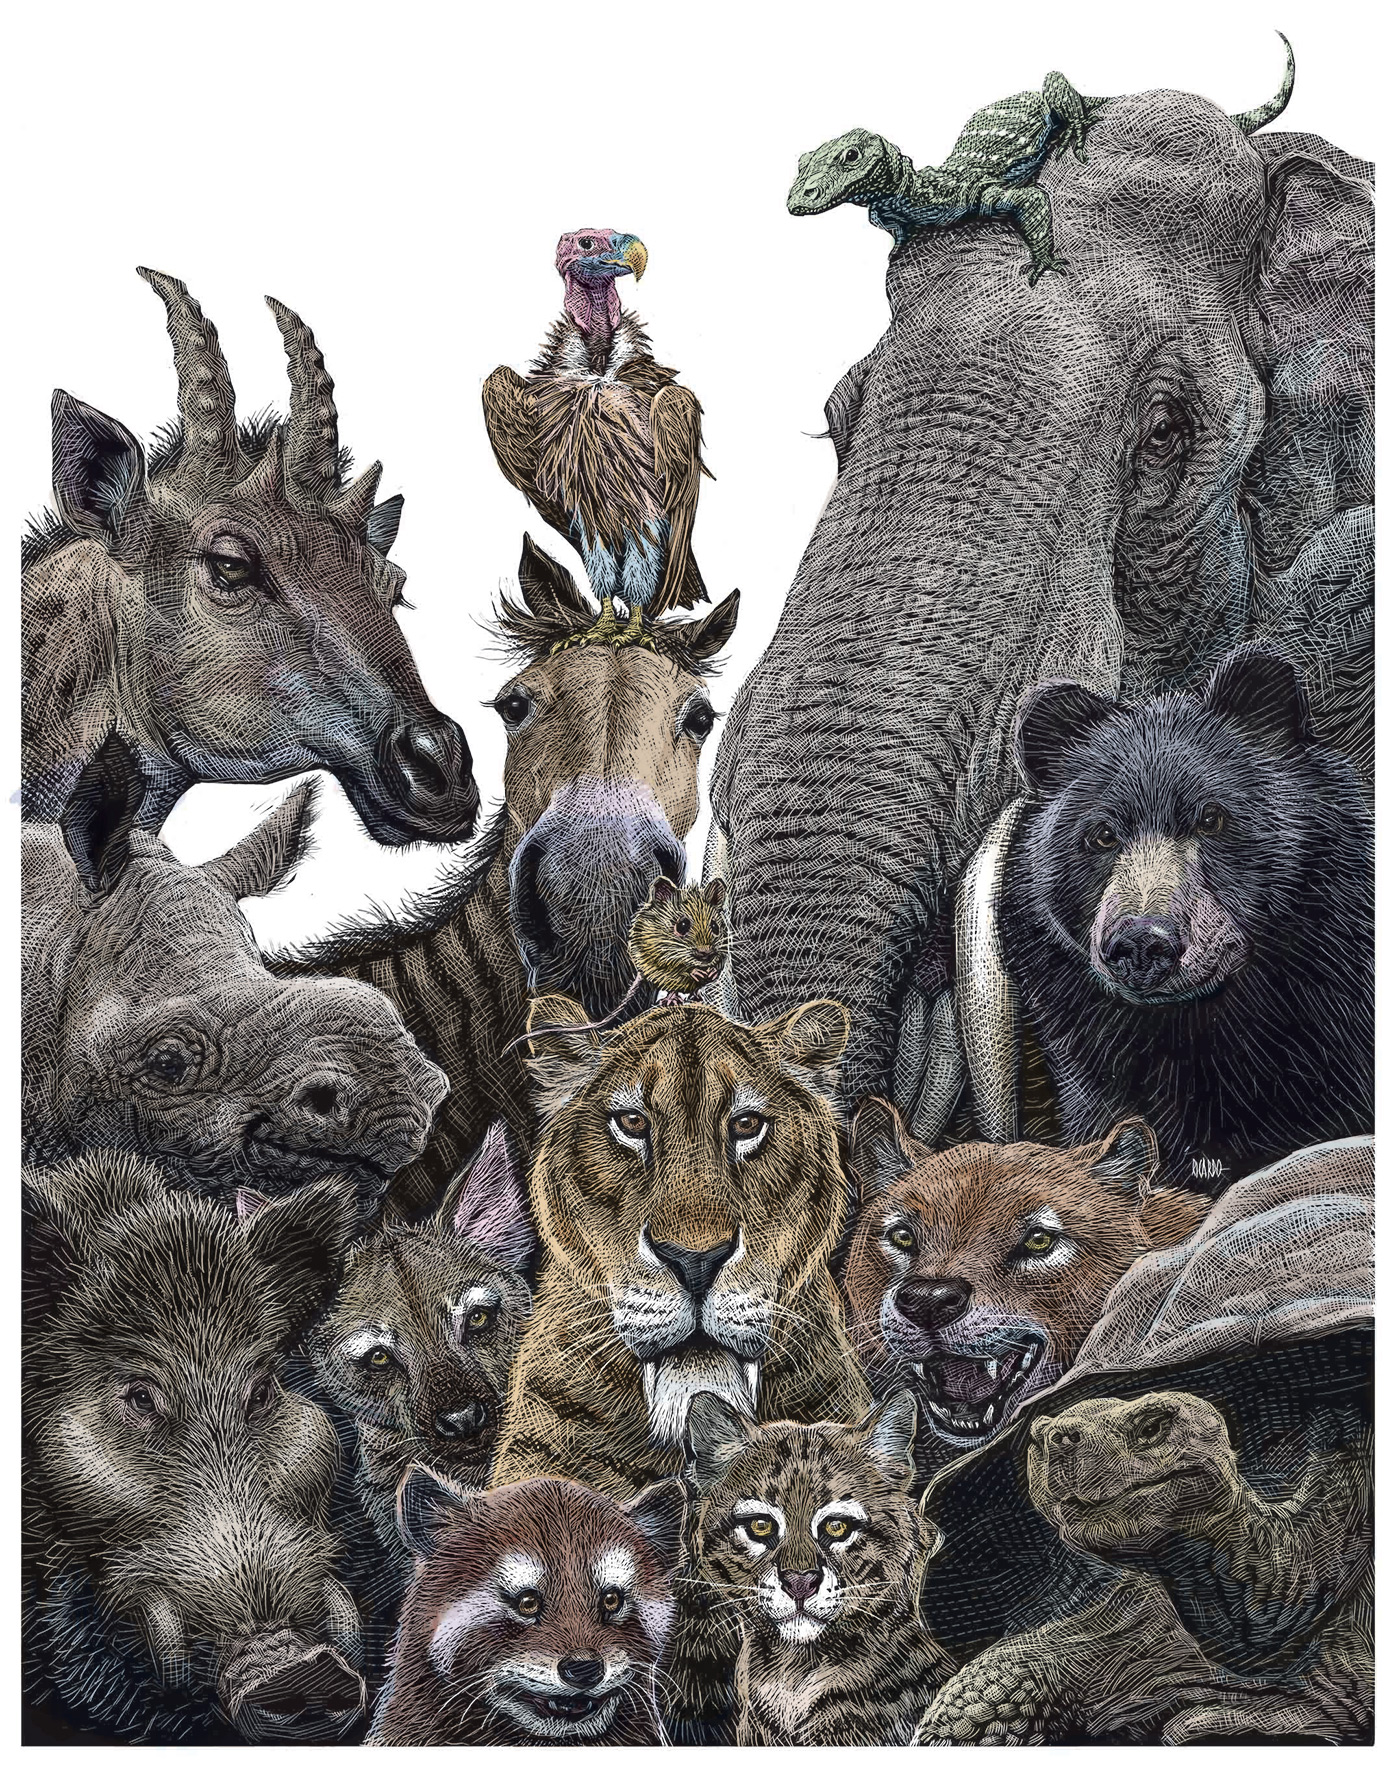 Richard Solomon - Ricardo-Martinez-324-Animales-prehistóricos-Madrid-color-copia